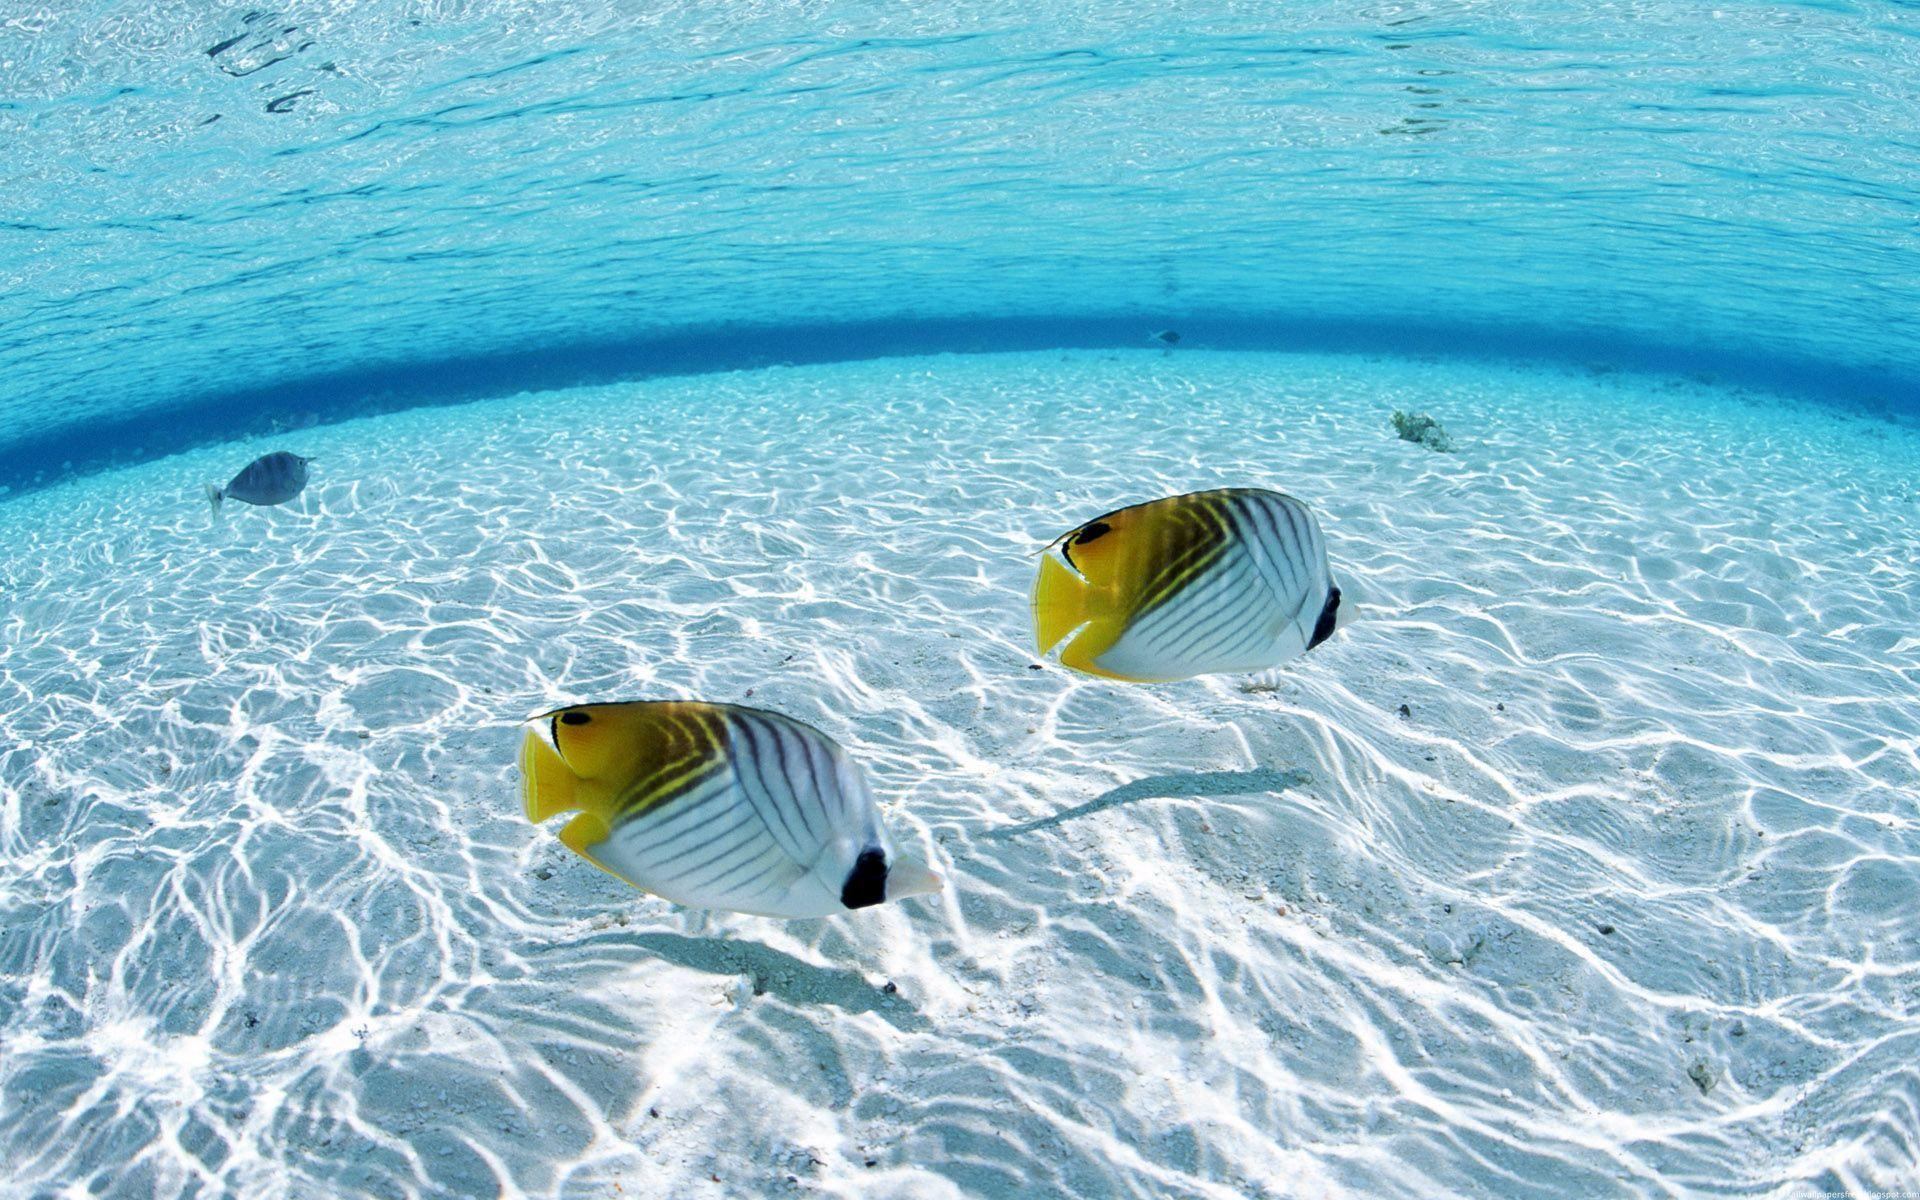 Underwater Wallpaper Image Picture